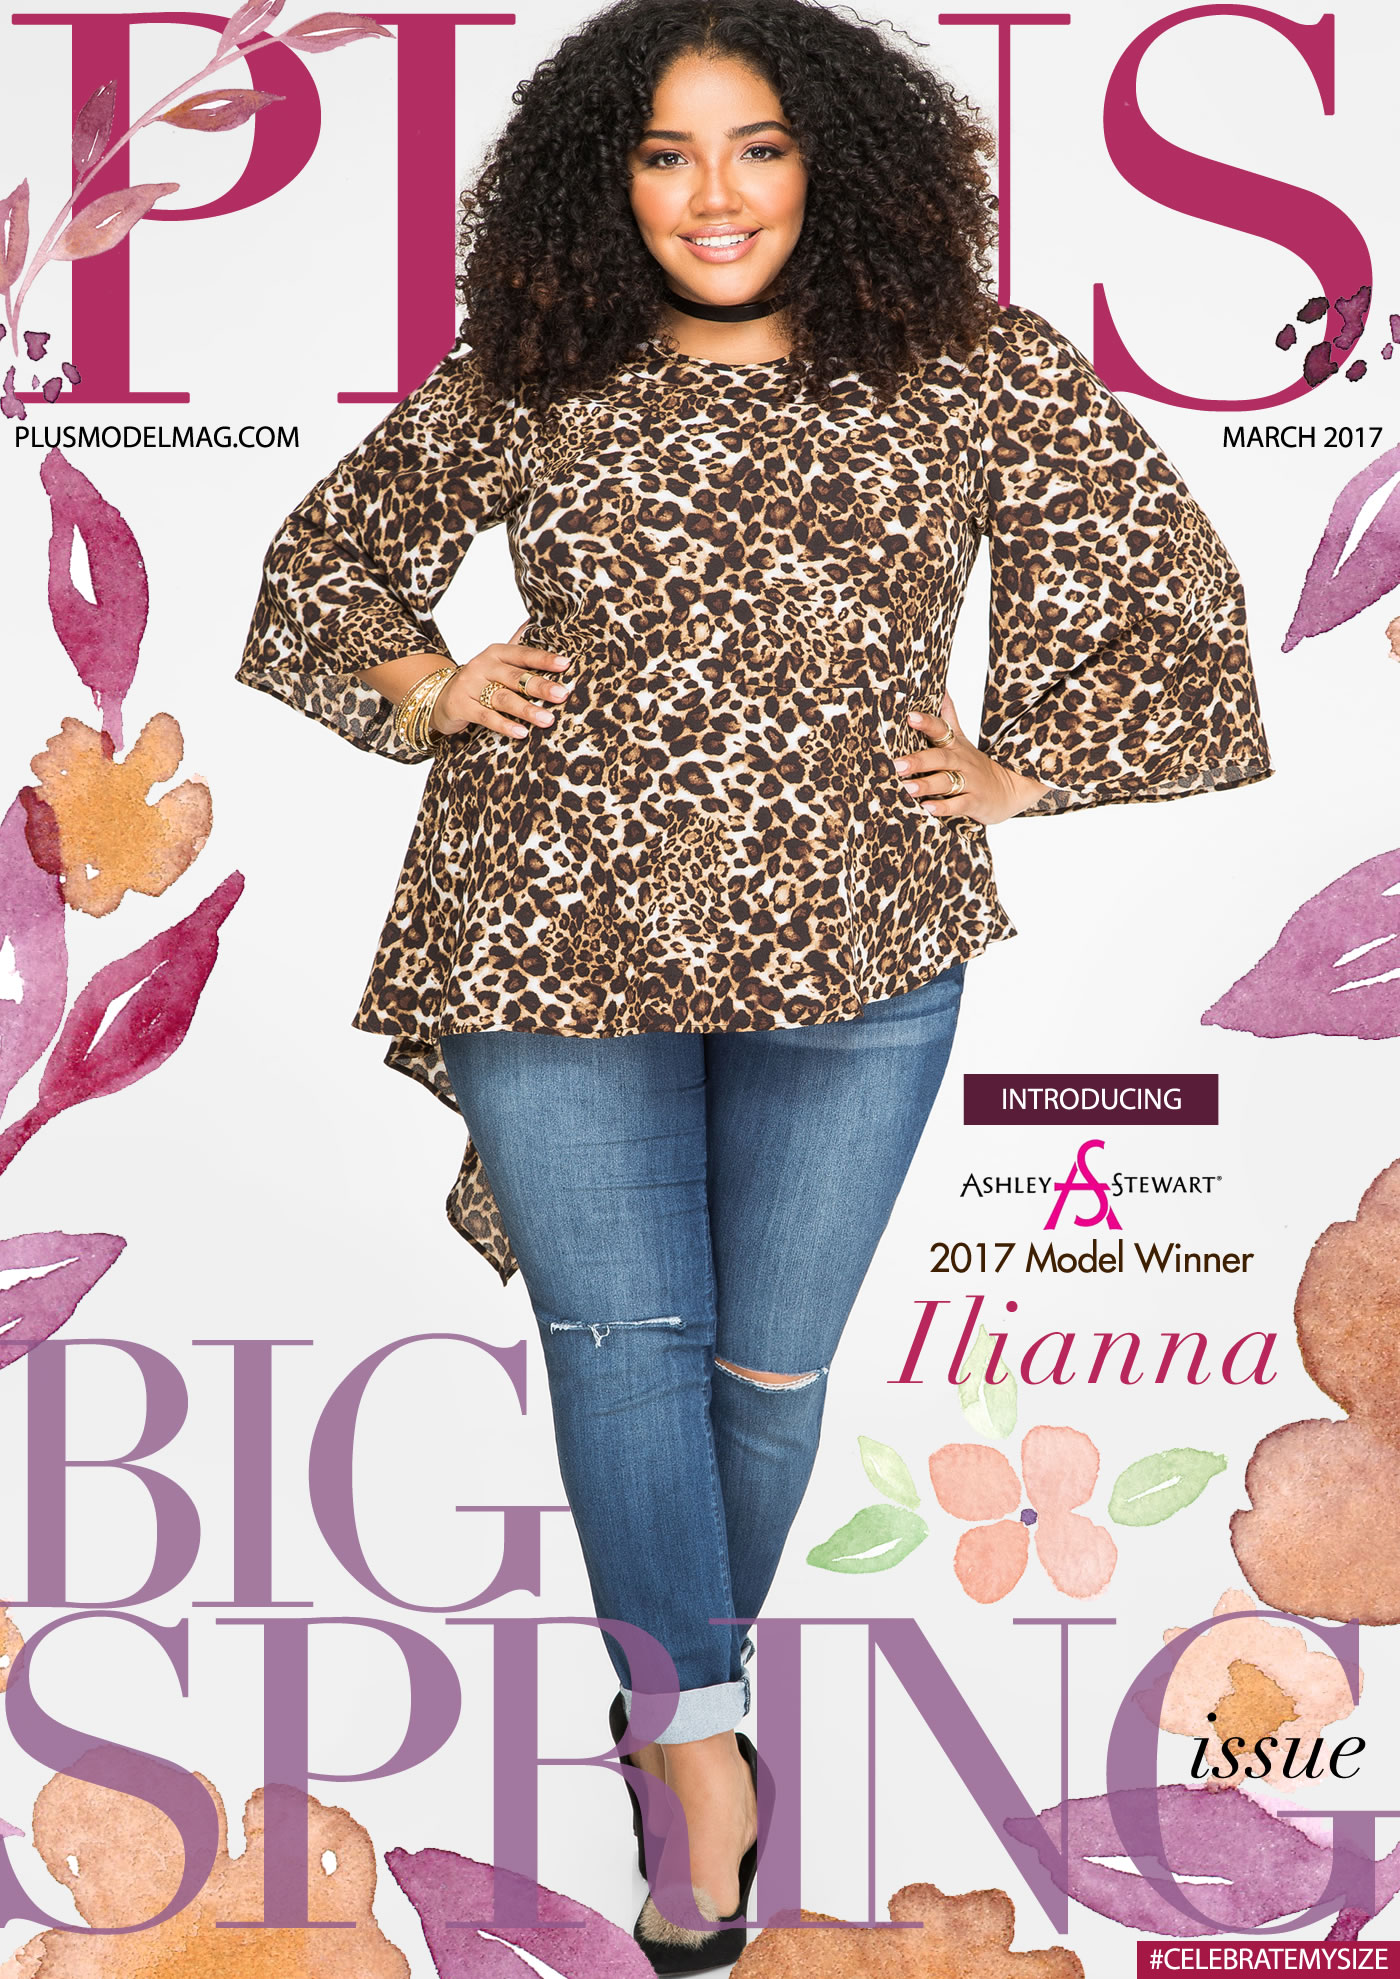 PLUS-Model-Magazine-March-2017-V2.jpg